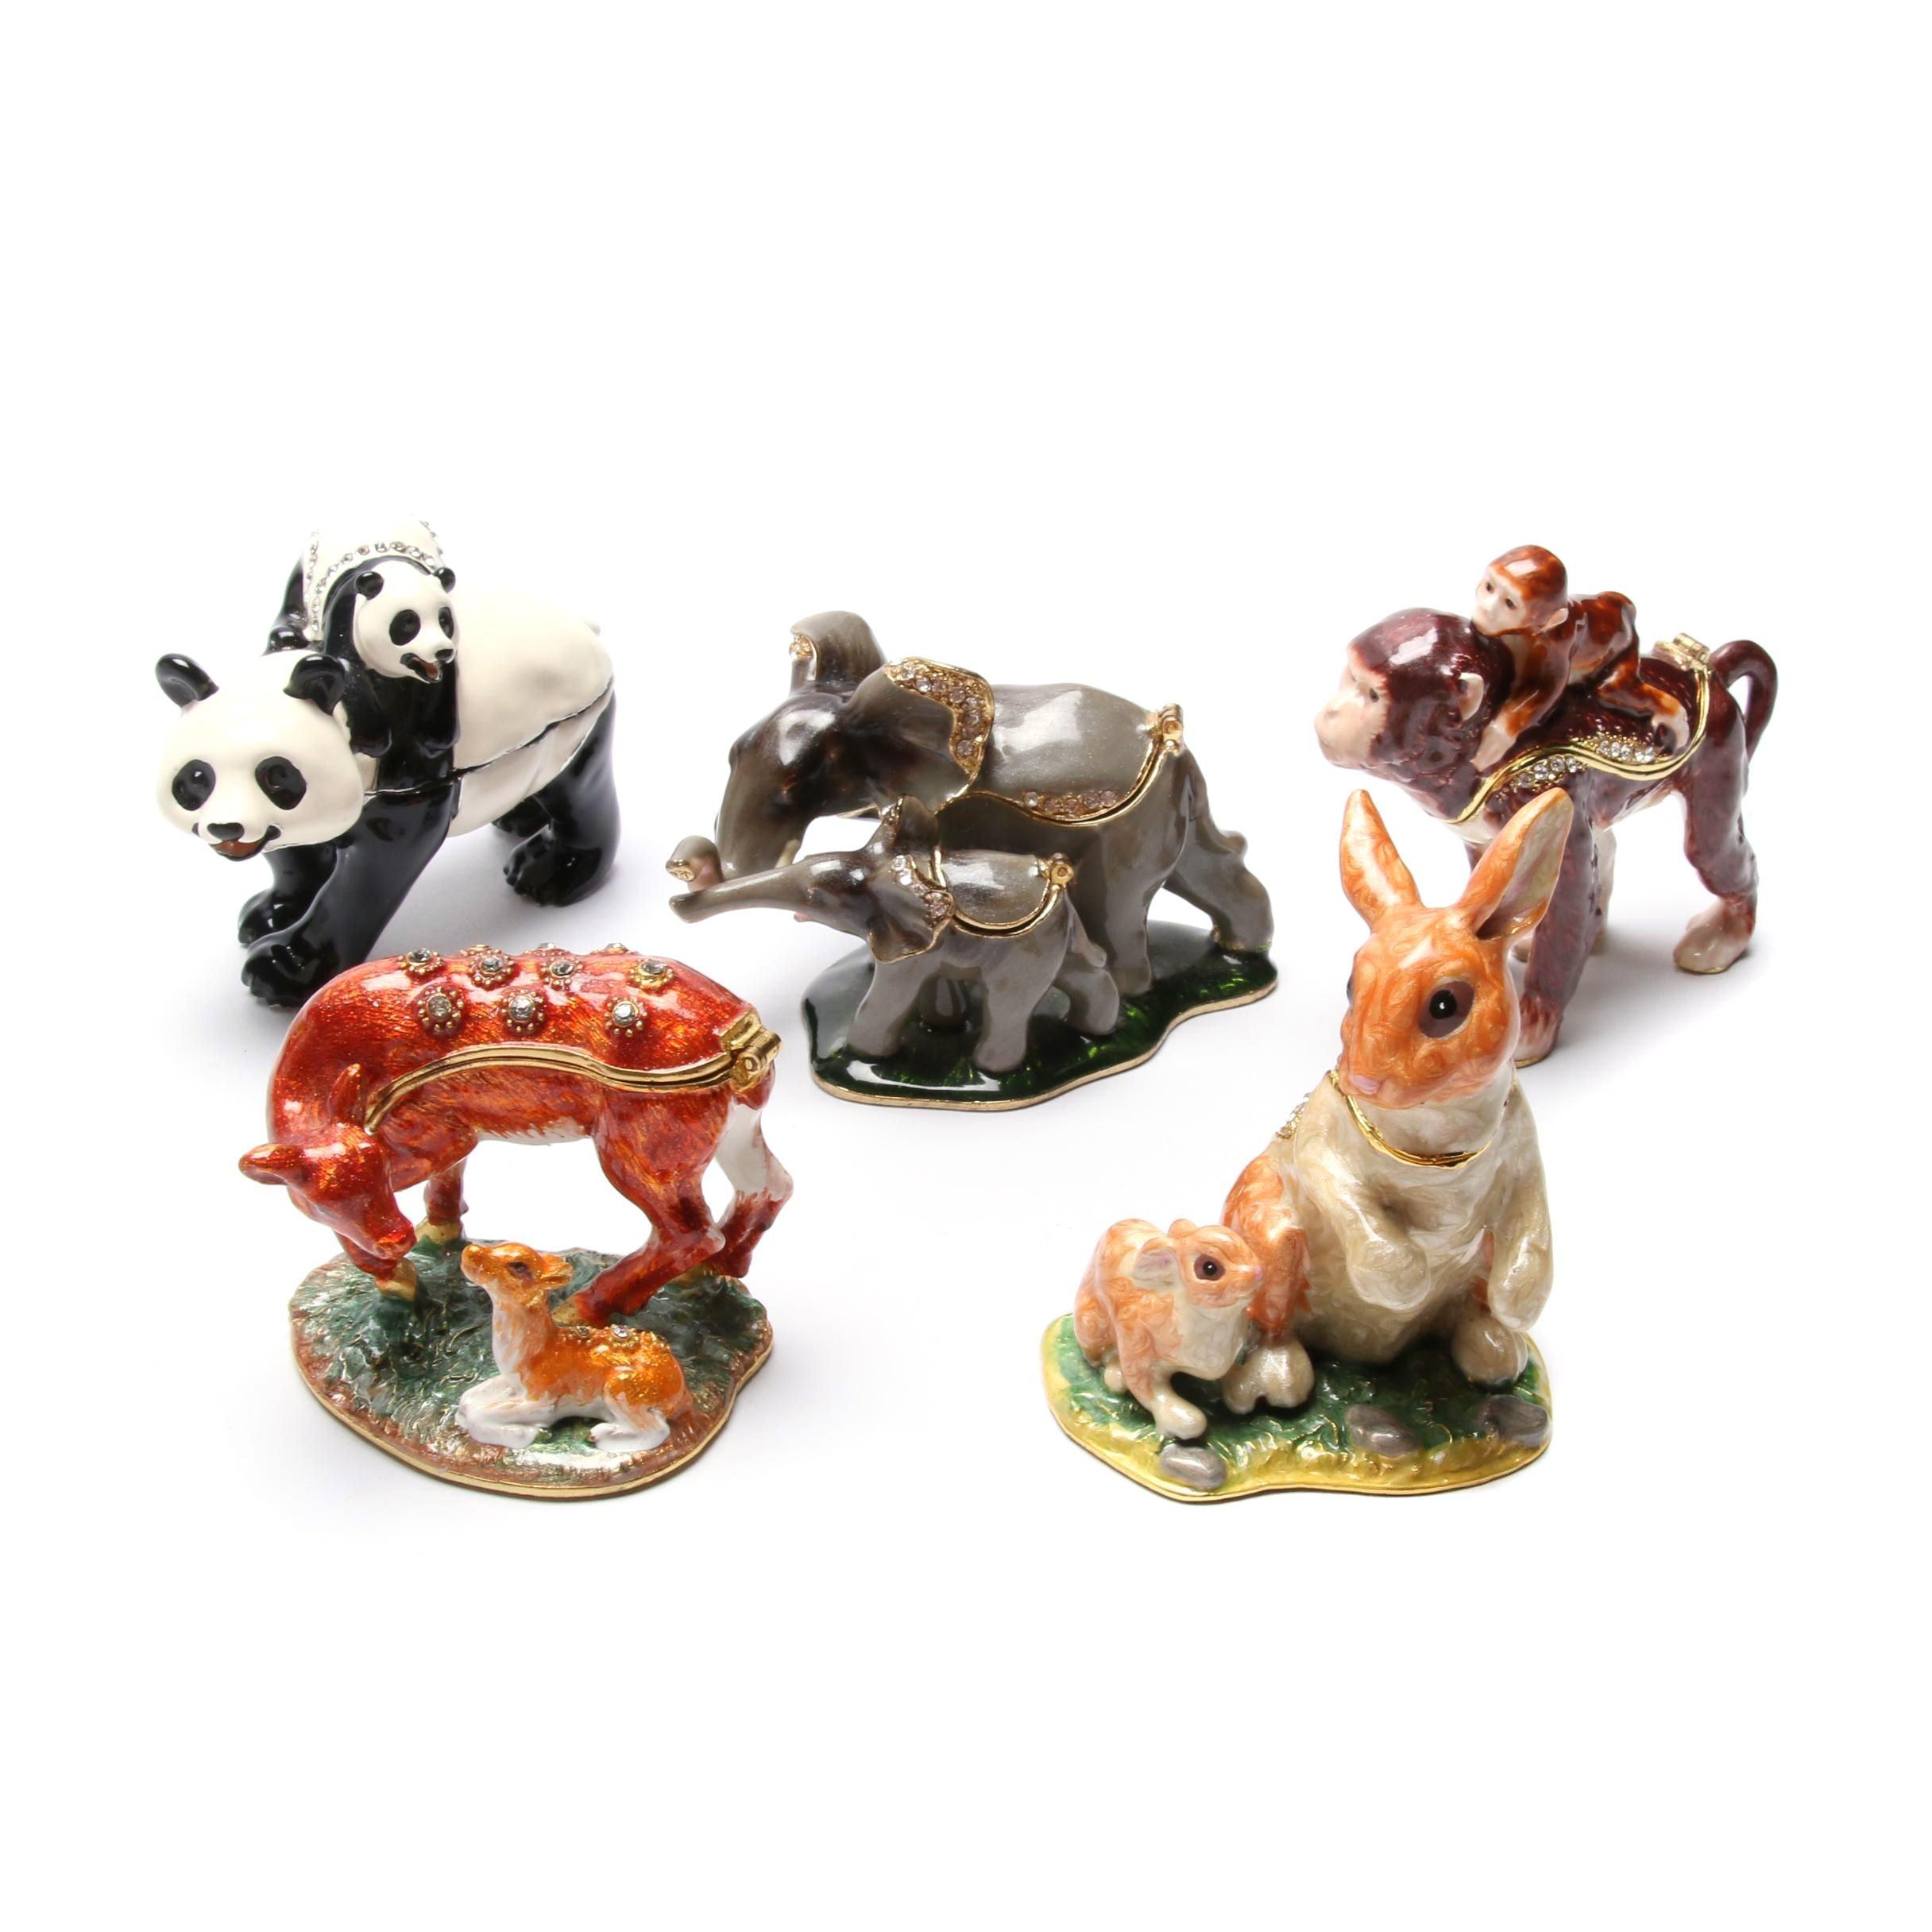 Animal Themed Jeweled and Enameled Trinket Boxes